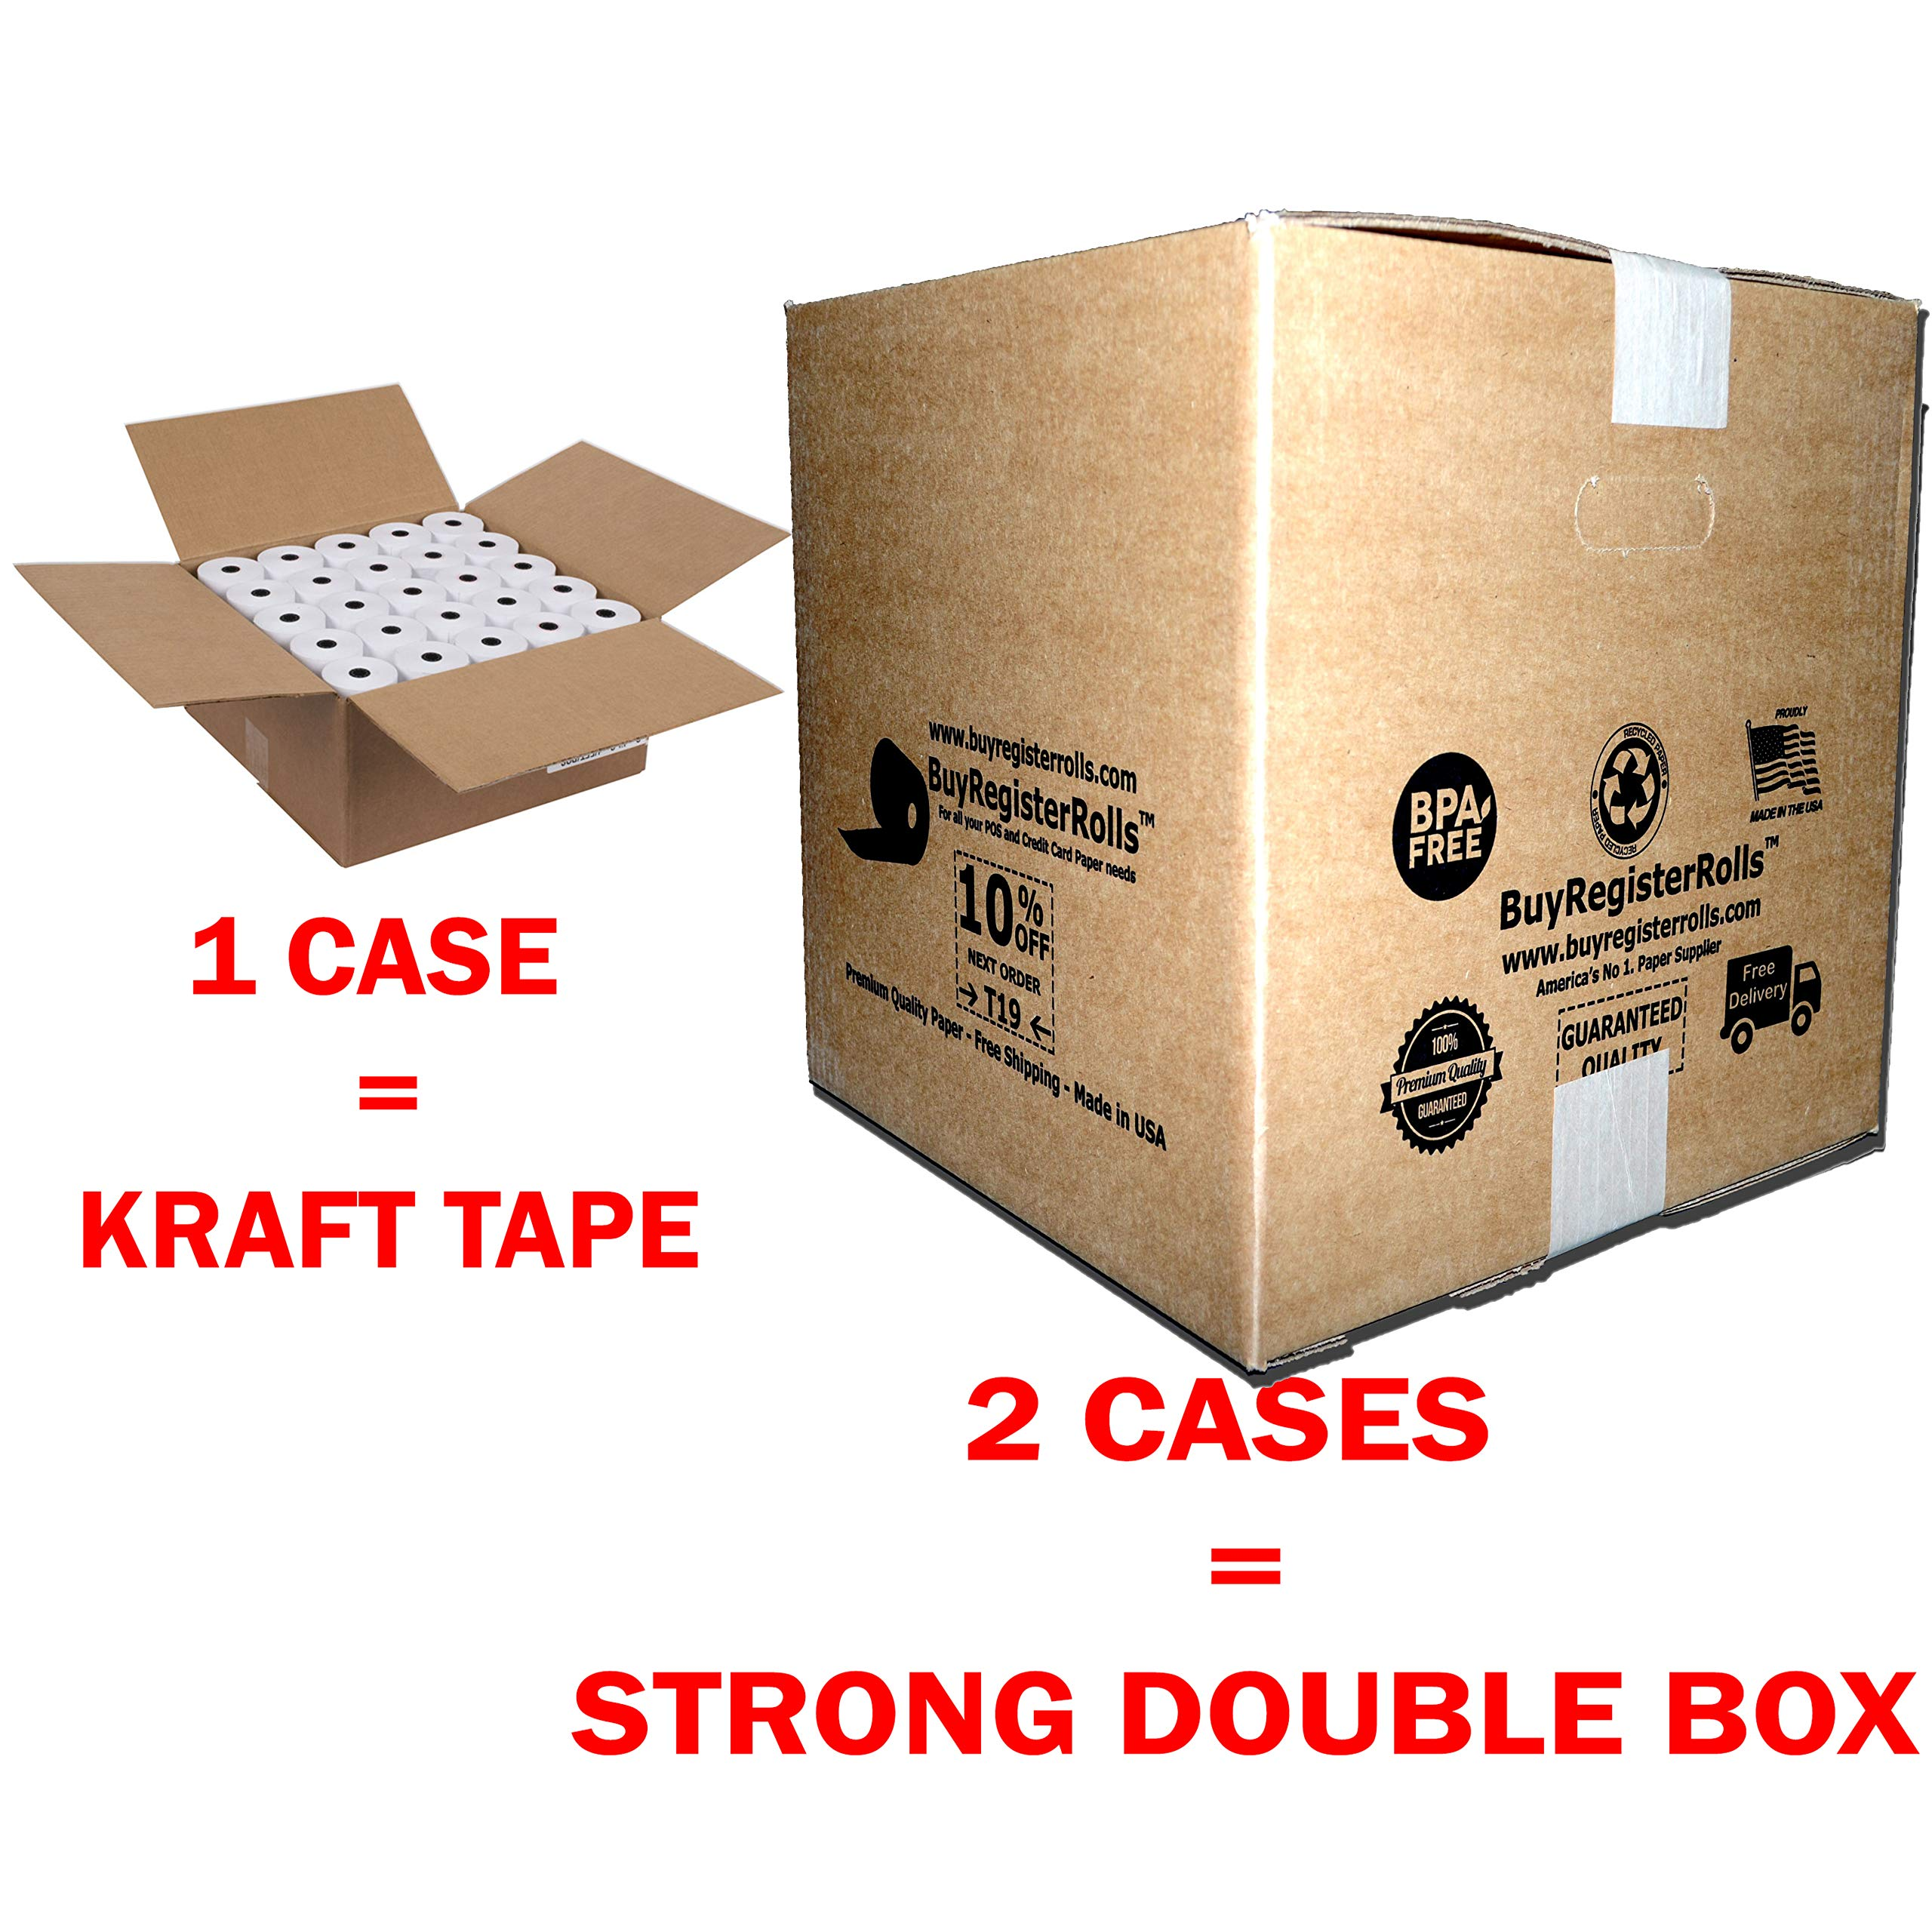 Star MICRONICS SP700 (All) 1-Ply 3 inch x 165' Paper Kitchen Printer Paper Rolls Premium Quality Bond Paper Made in USA from BuyRegisterRolls (200 Rolls) by BuyRegisterRolls